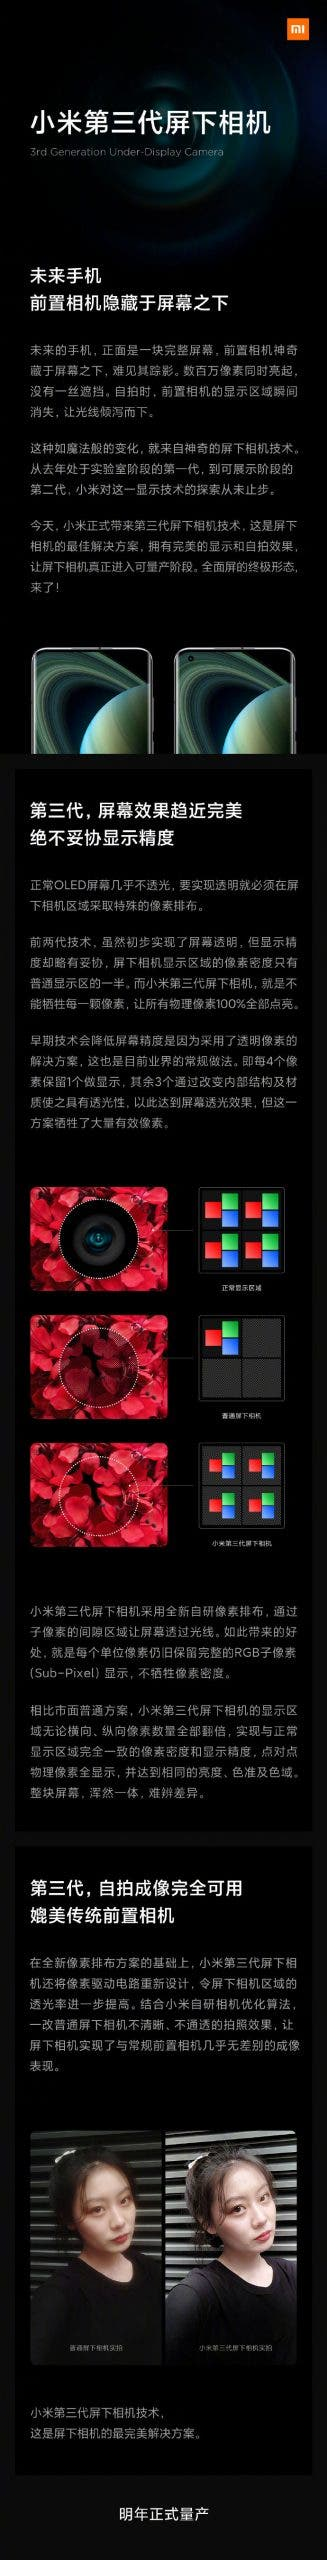 Xiaomi's third-generation under-screen camera technology